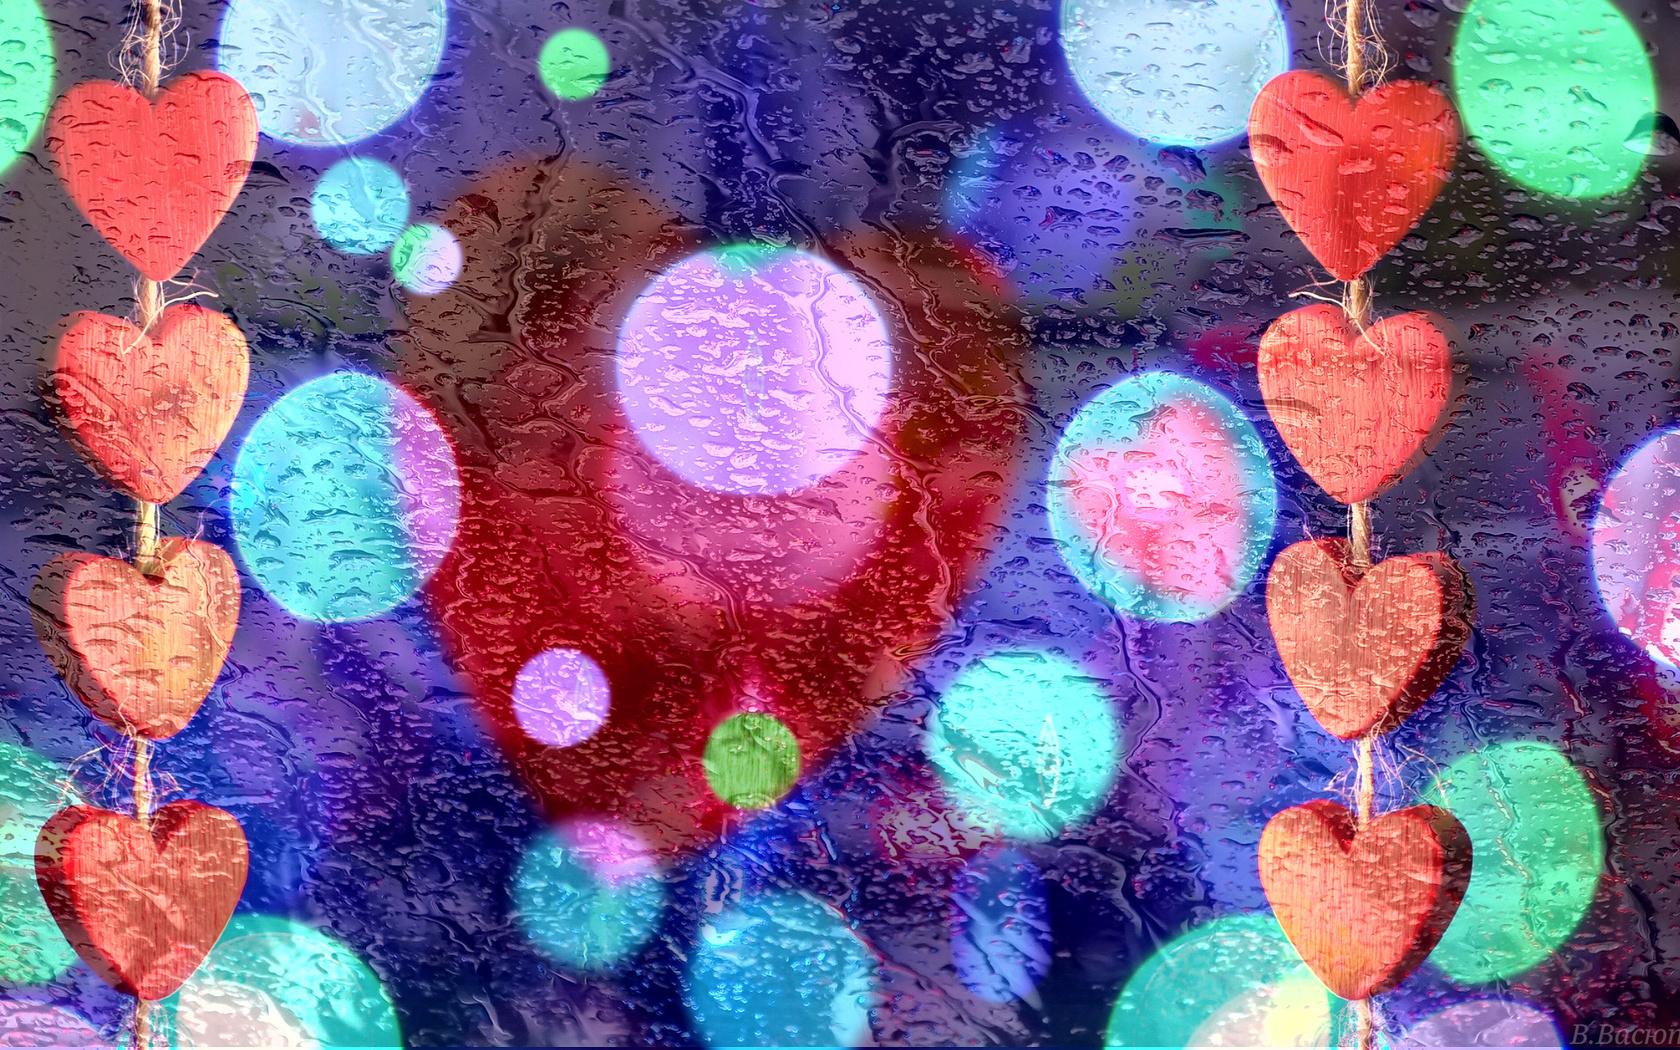 стекло, капли, дождь, сердечки